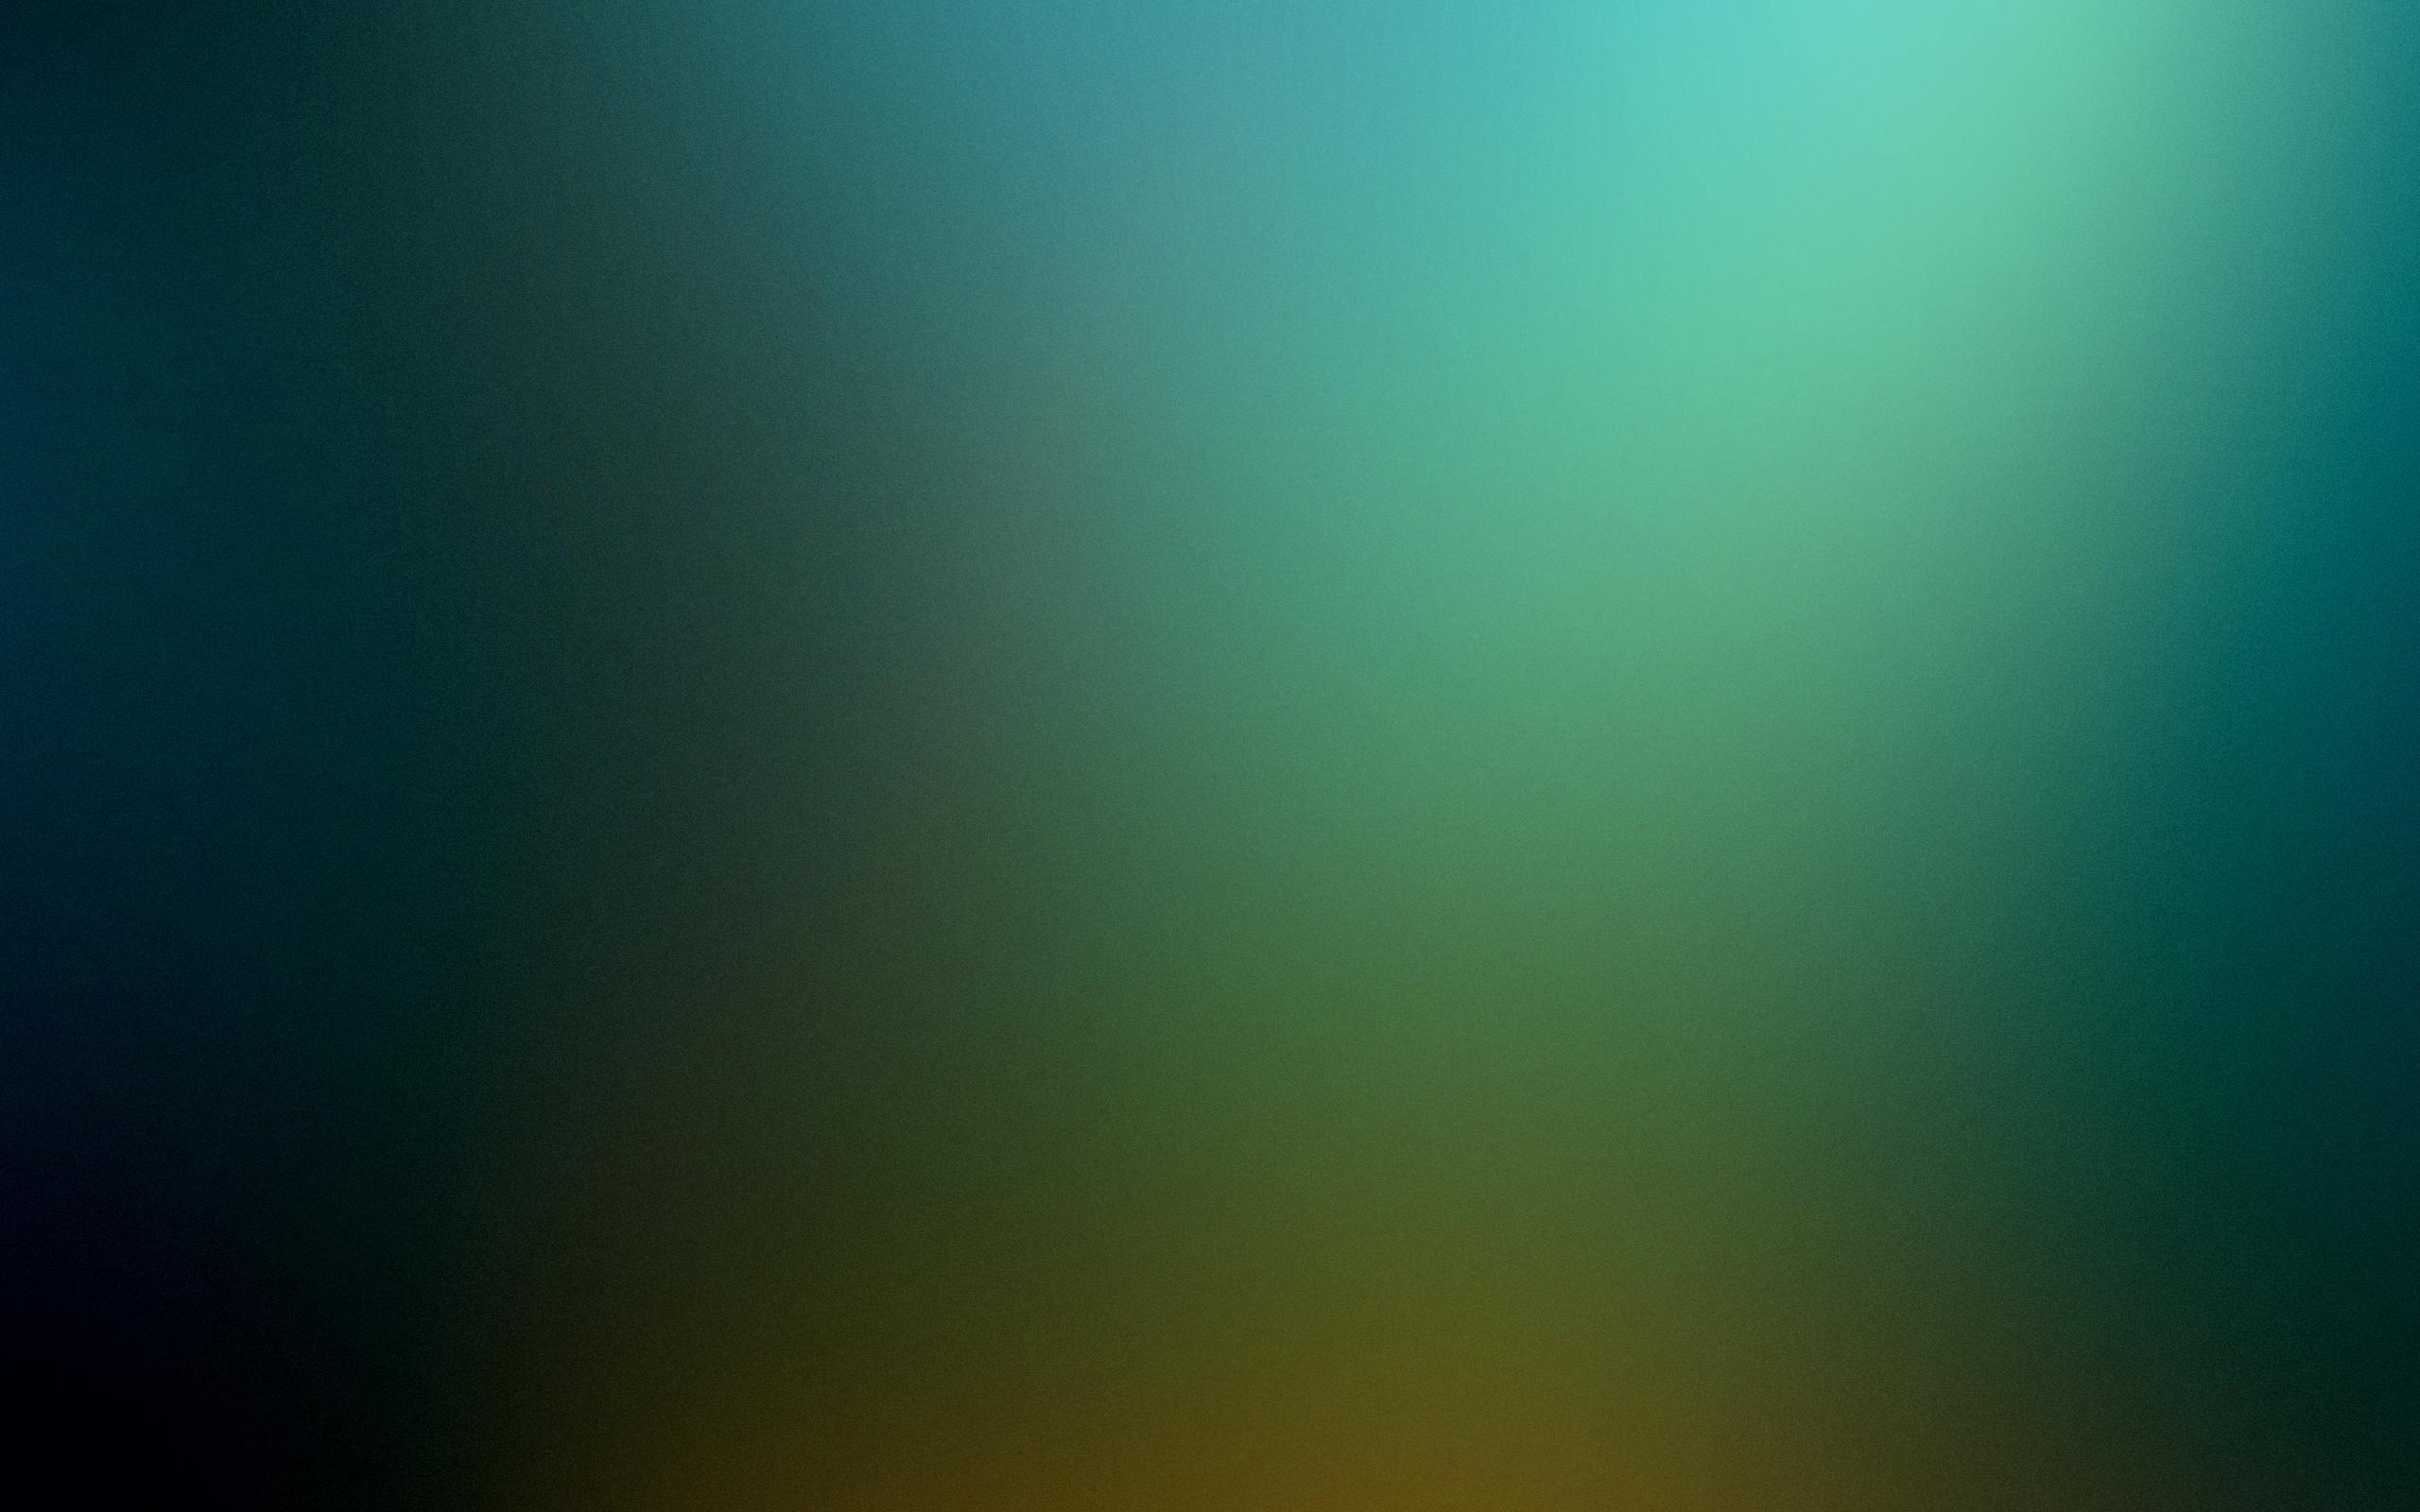 colors, hd backgrounds, texture wallpapers, обои, текстуры ...: https://wallbox.ru/wallpaper/15548